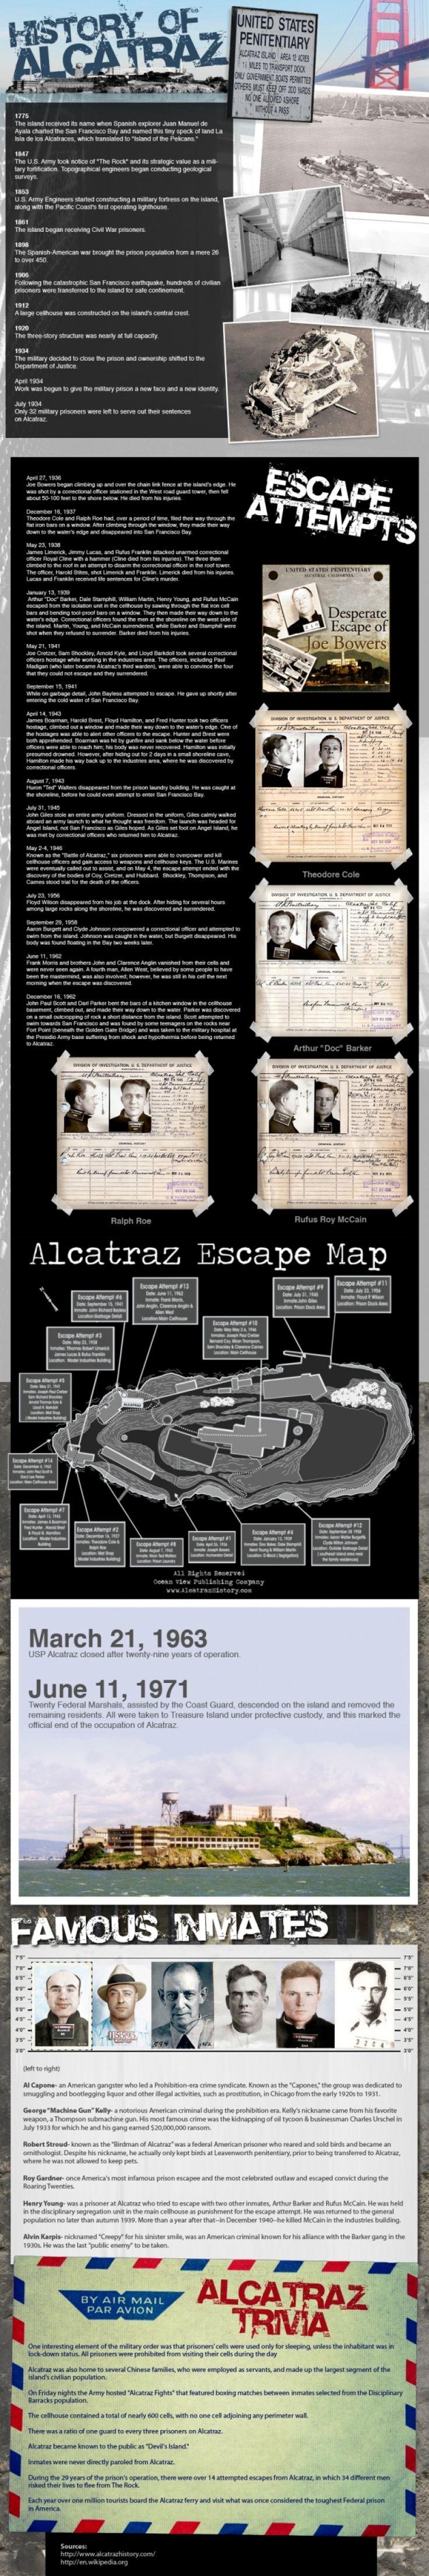 ideas about federal prison inmates classic the prison island of alcatraz